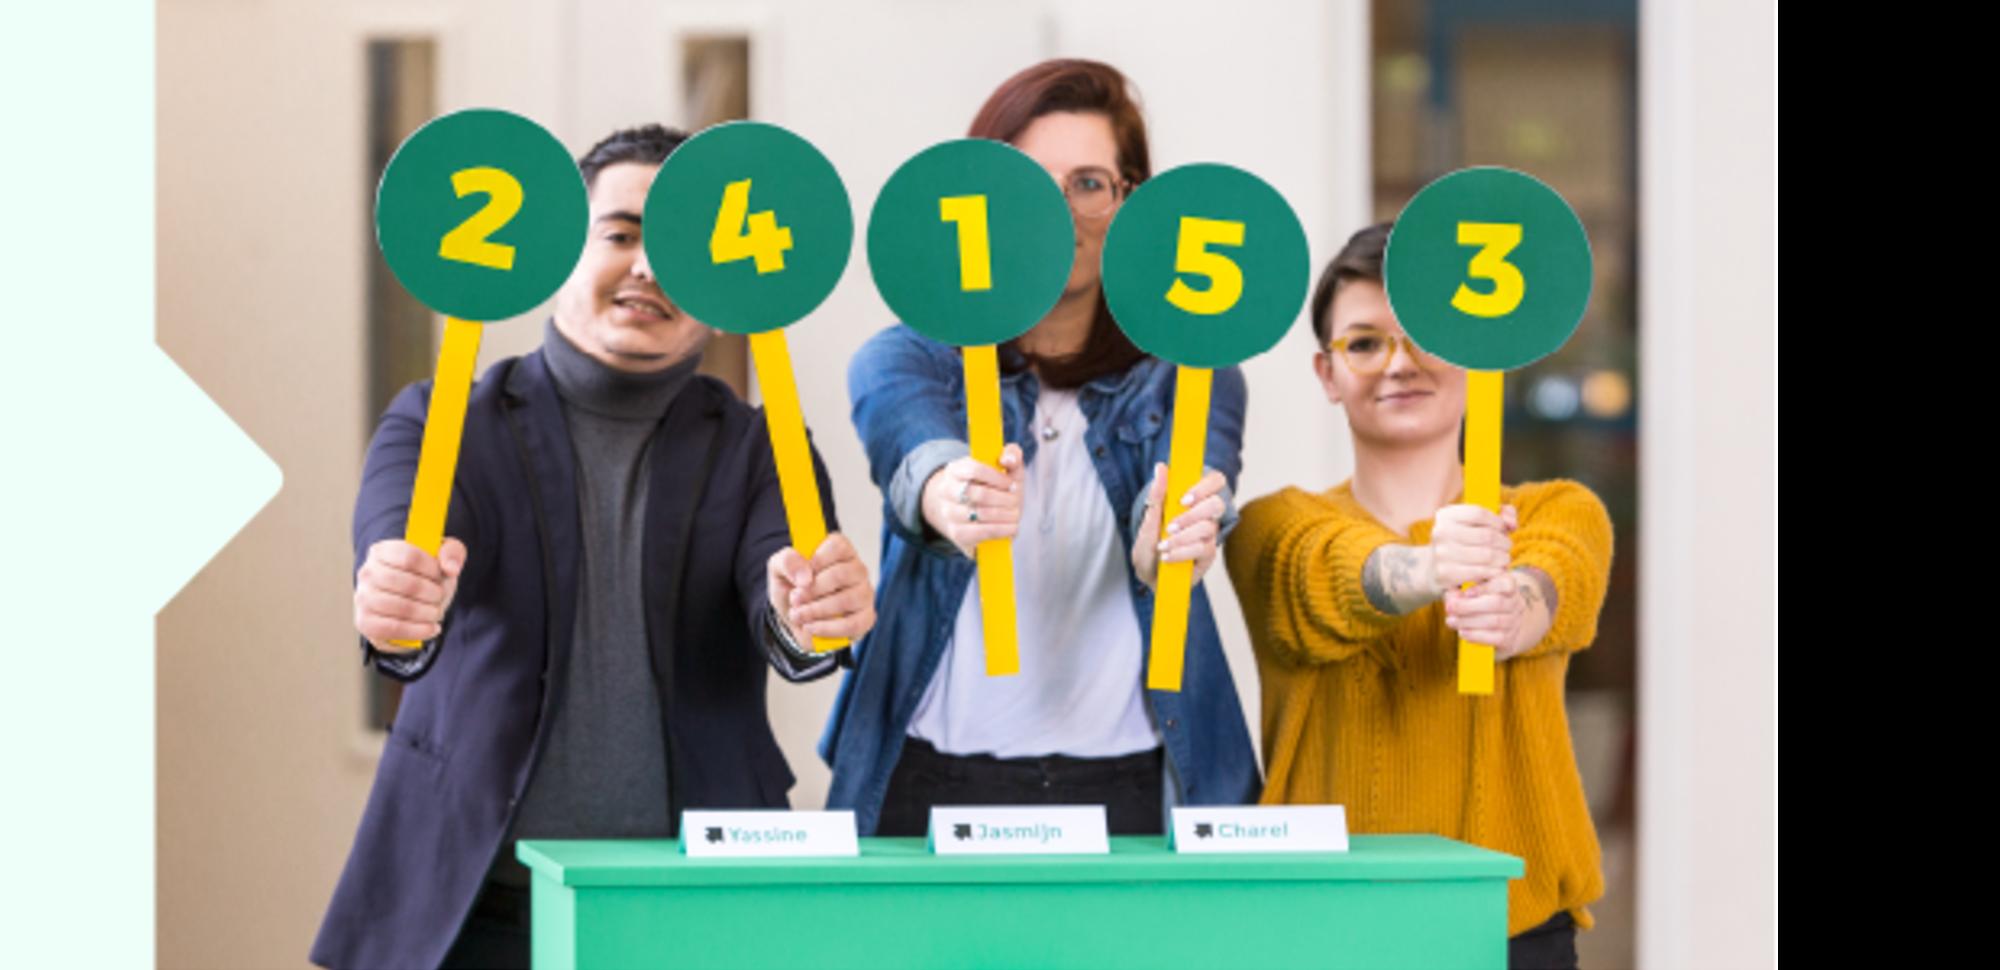 Resultaten Nationale Studenten Enquête 2018 bekend!